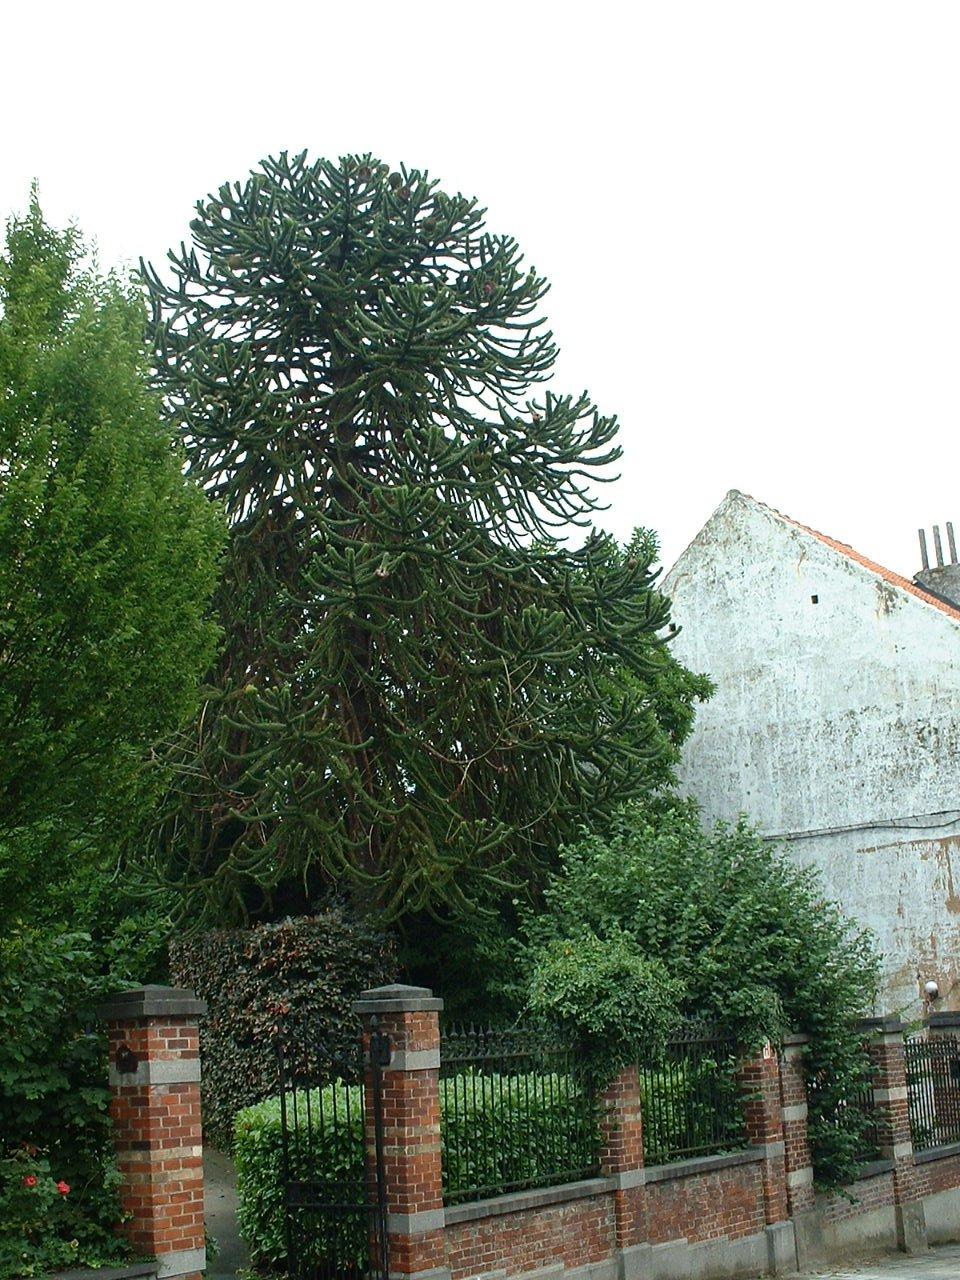 Araucaria du Chili – Watermael-Boitsfort, Drève du Duc, 101 –  07 Août 2002